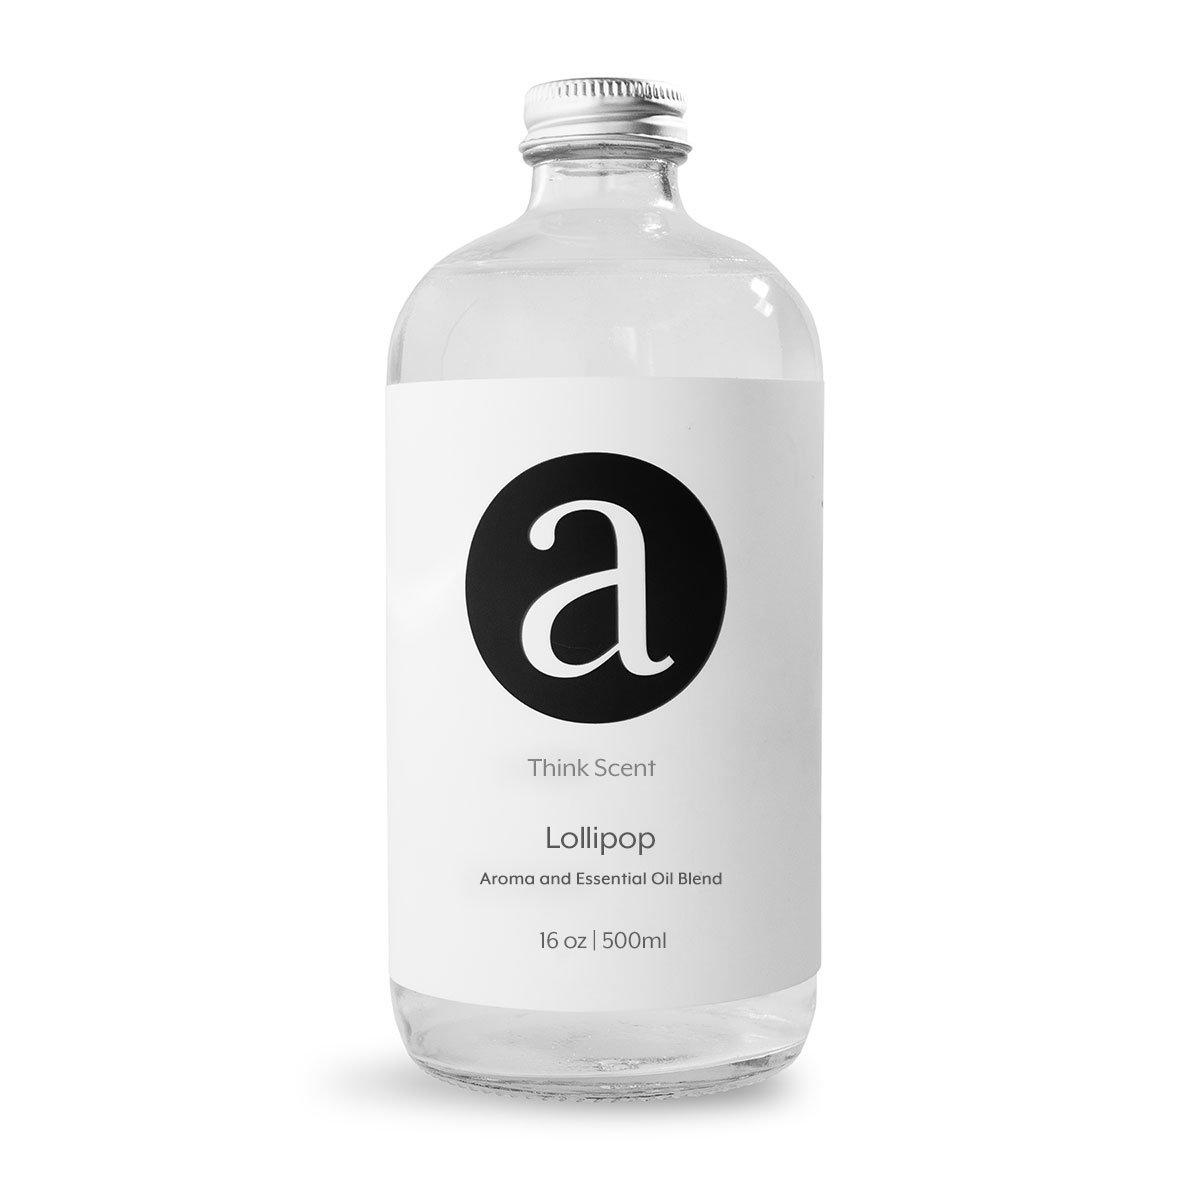 (Lollipop) Aroma / Fragrance Oil For AromaTech Air Freshener Scent Diffuser (Half Gallon)